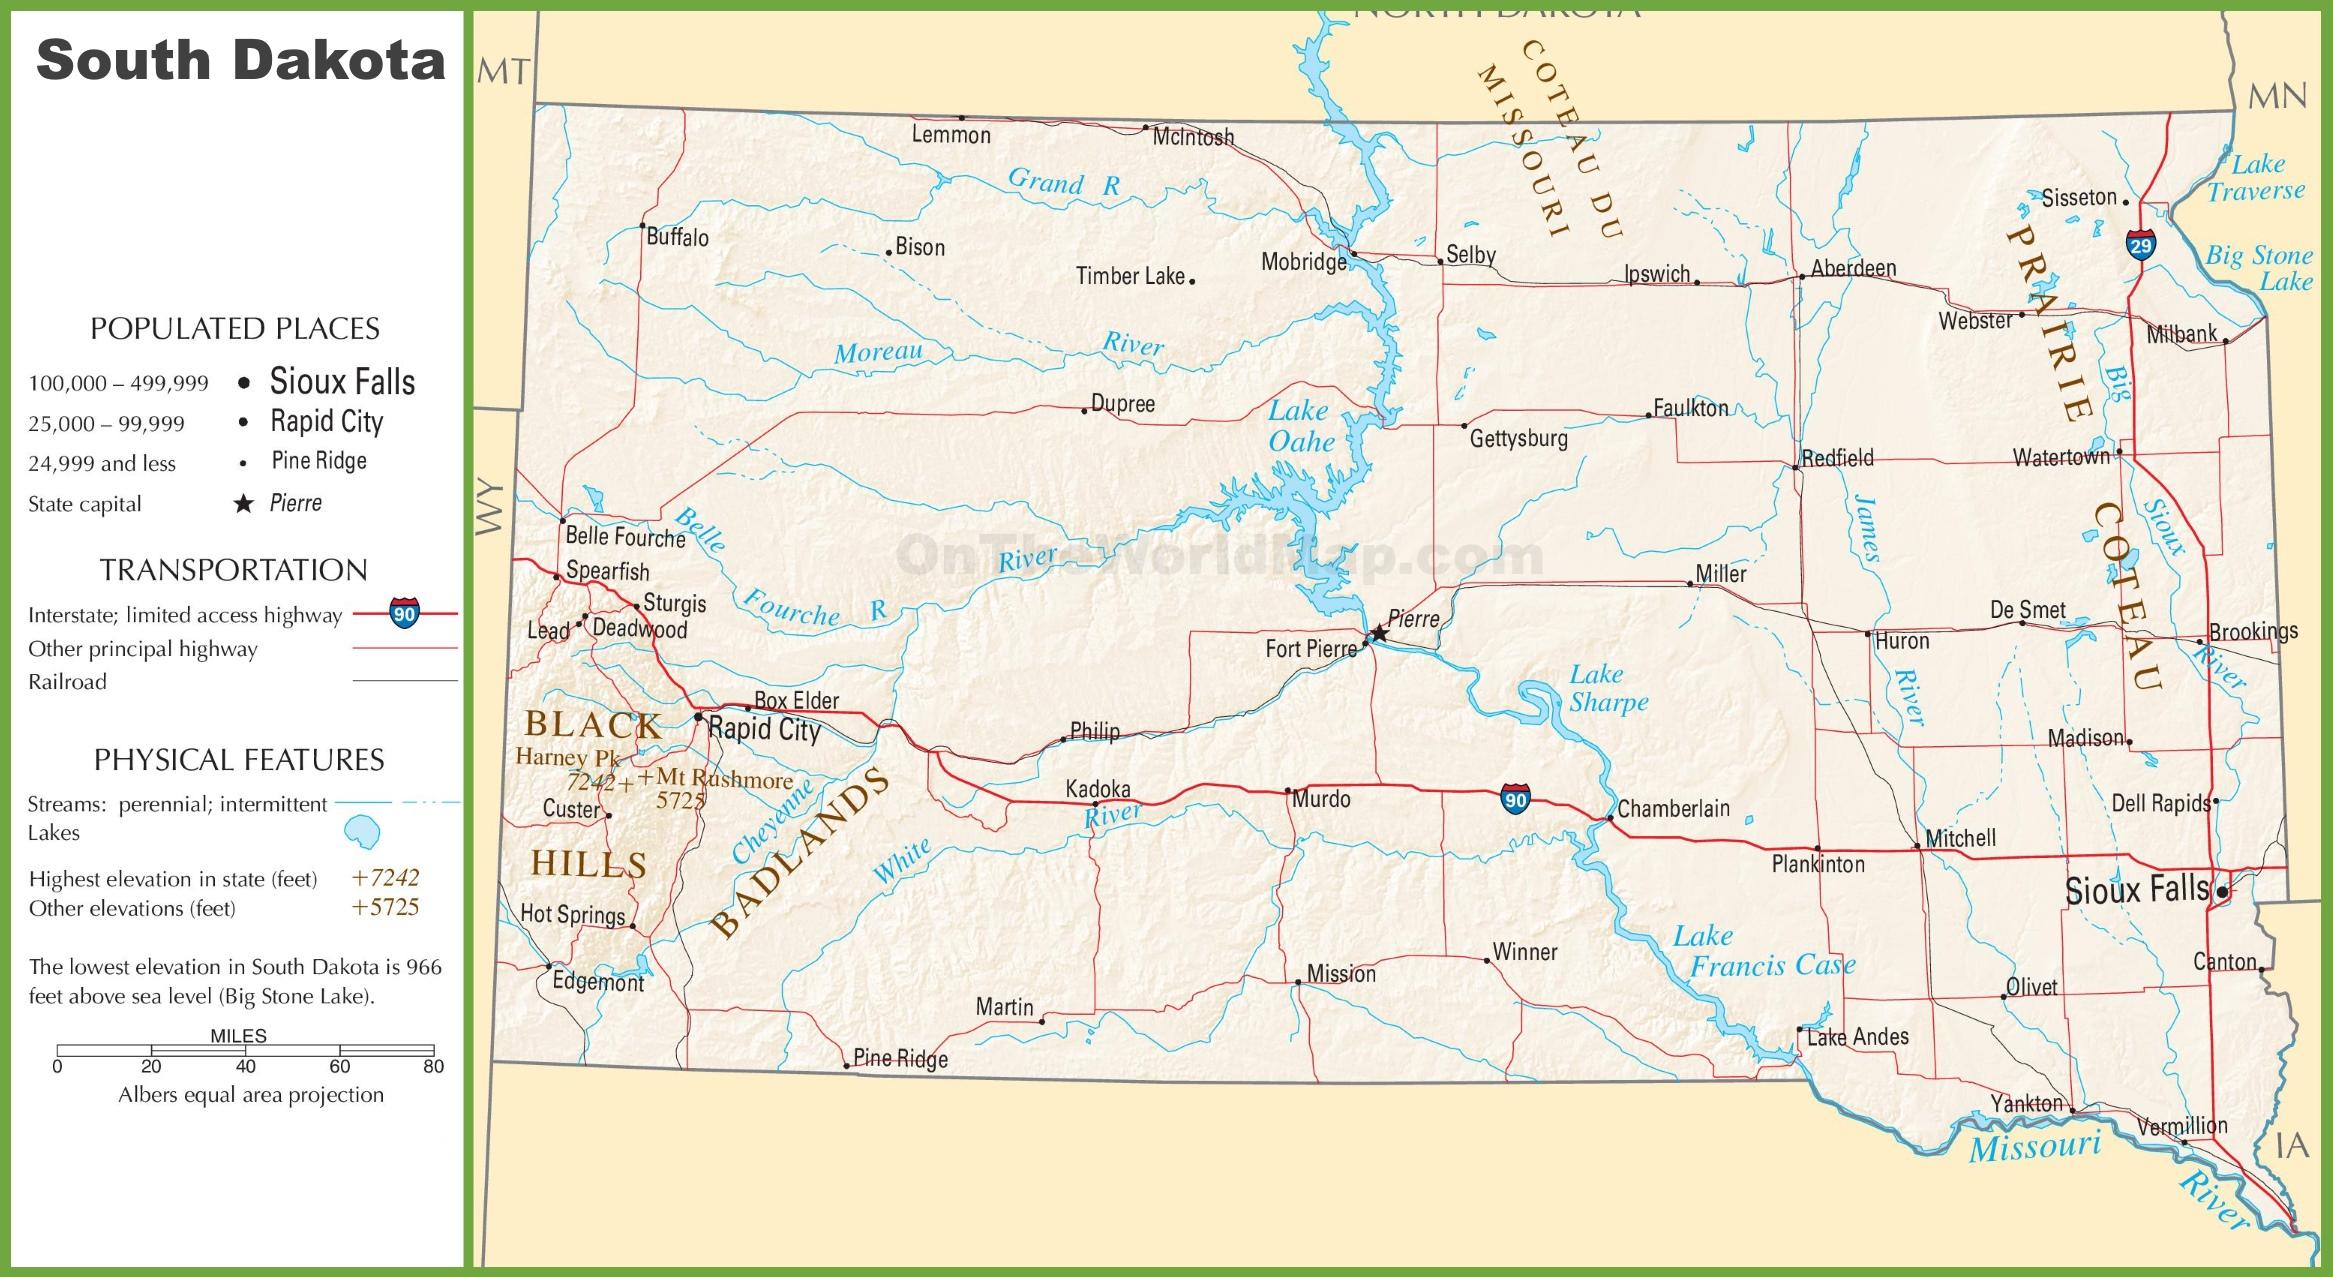 South Dakota Highway Map South Dakota highway map South Dakota Highway Map